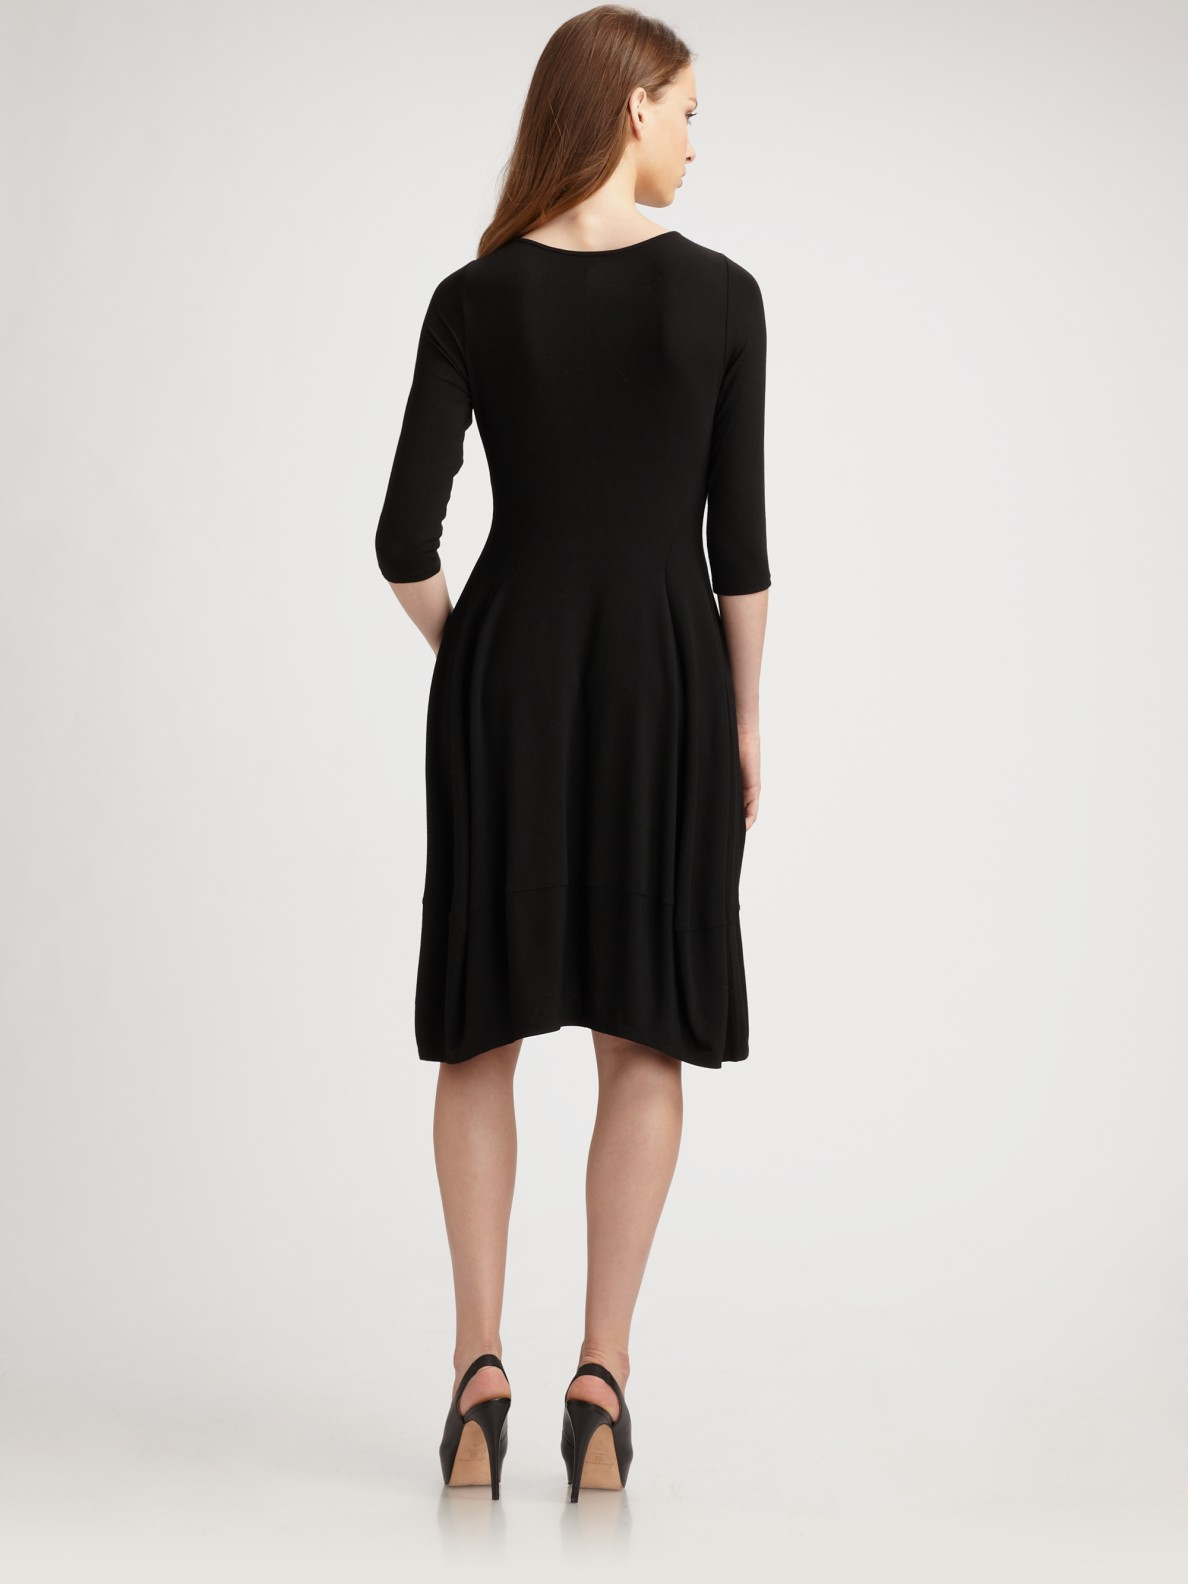 Lyst Eileen Fisher Stretch Jersey Dress In Black